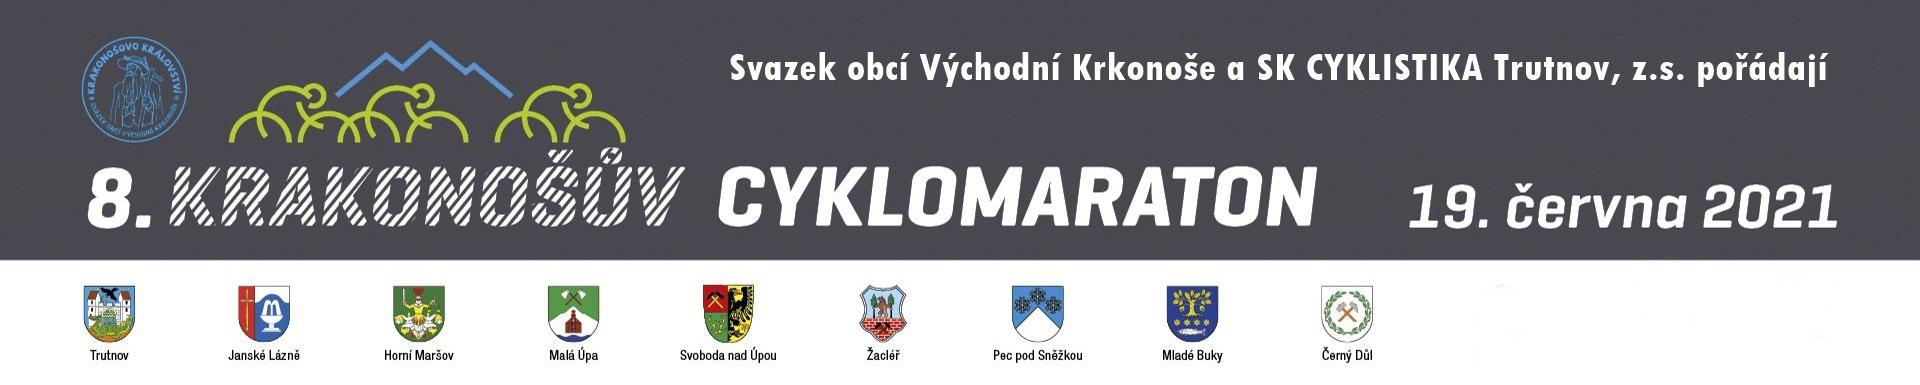 Krakonošův cyklomaraton aneb poprava vedrem (140 km, Trutnov)